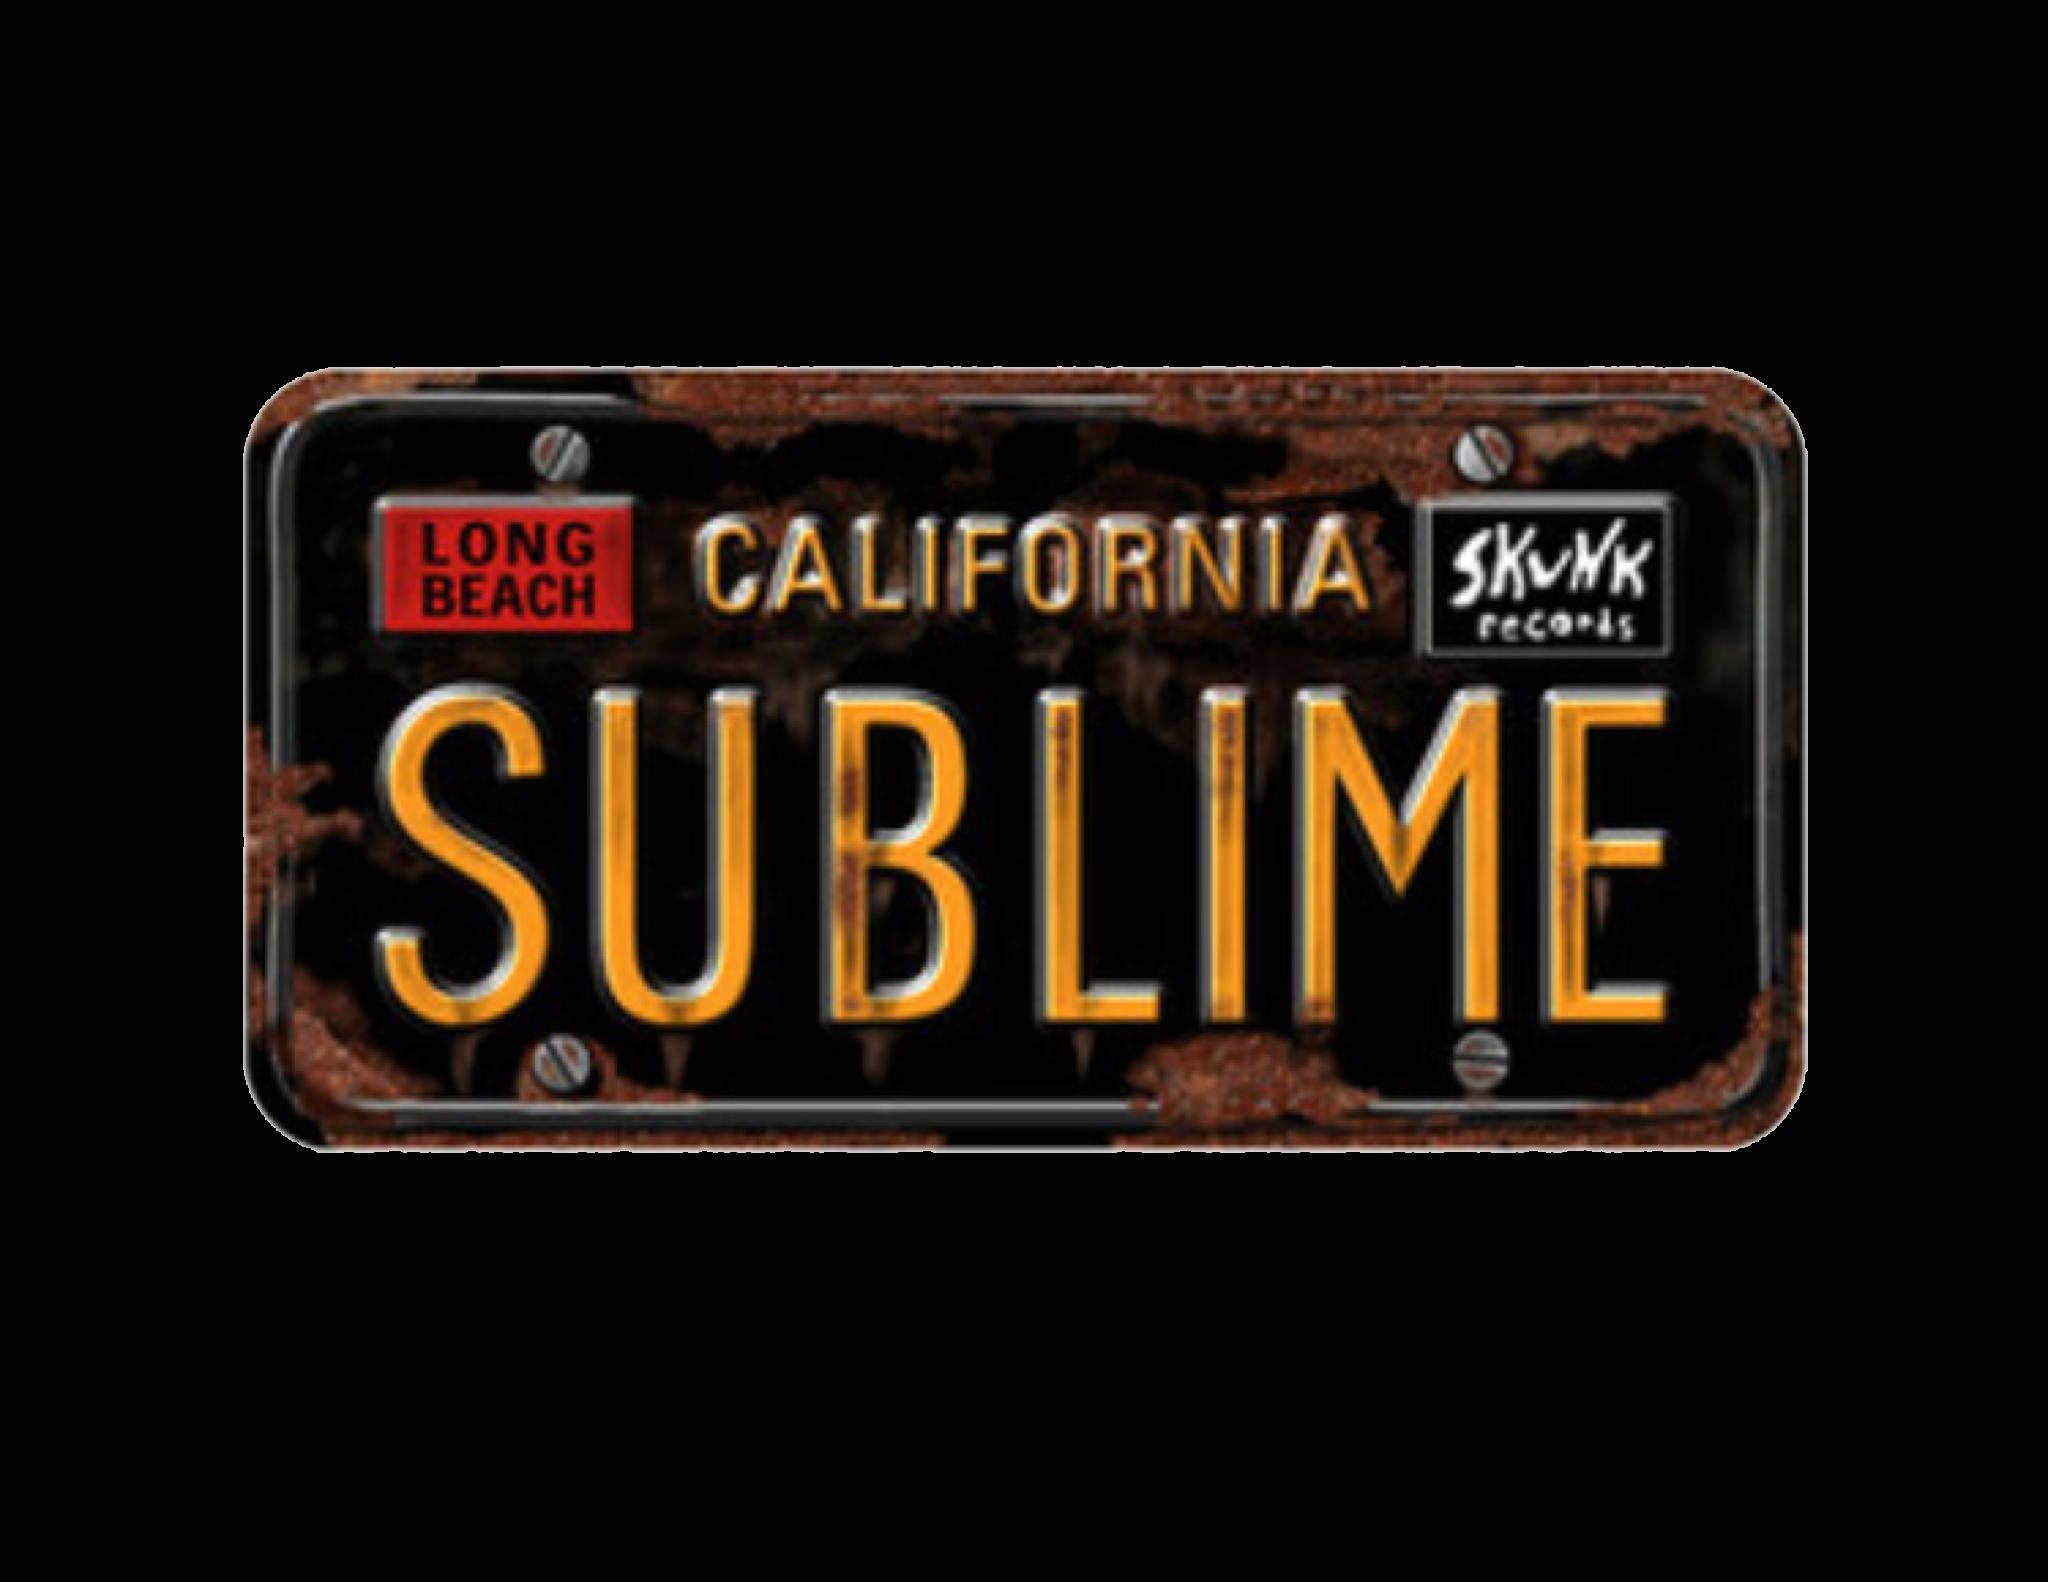 California License Plate Black Sublime Polyvore Moodboard Filler Mood Boards Plate Png The Secret History